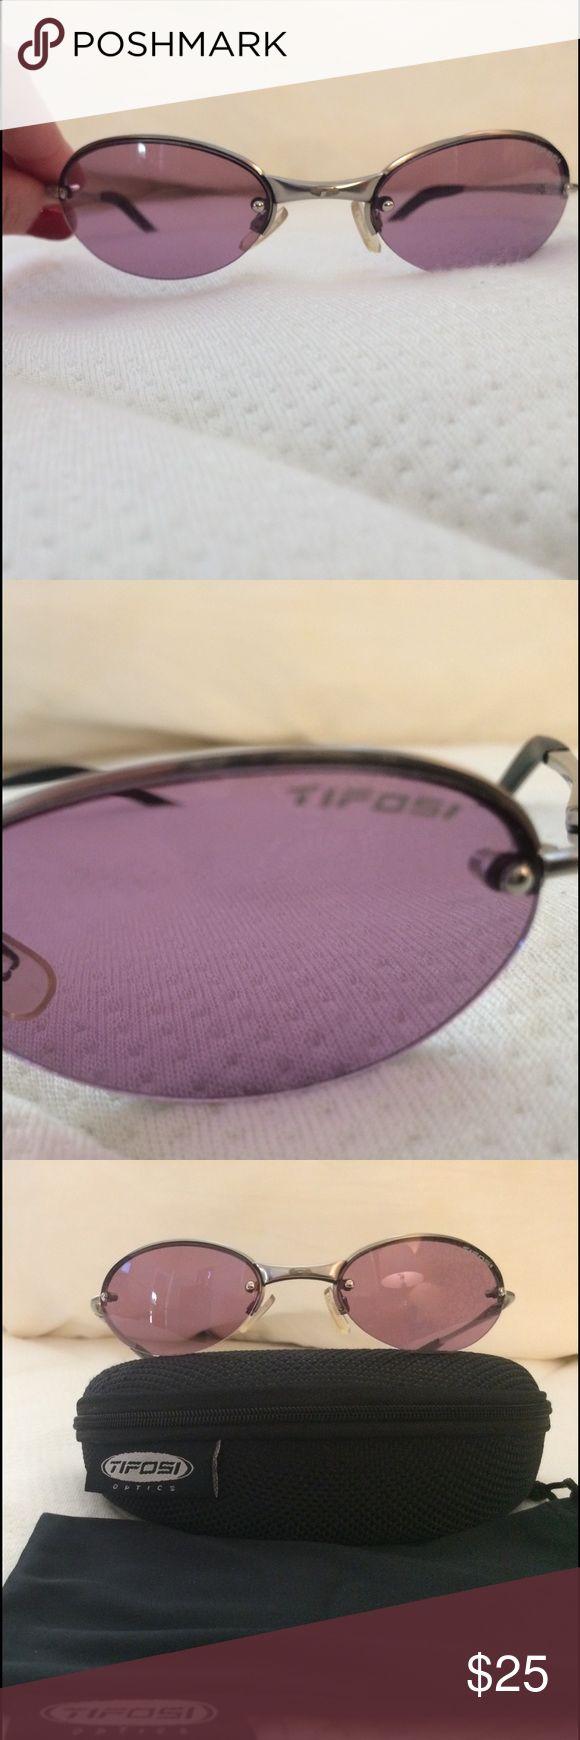 Tifosi 😎 sunglasses Tifosi purple tinted sunglasses. Like new. Rarely worn. Includes soft and hard case. Tifosi Optics Accessories Sunglasses